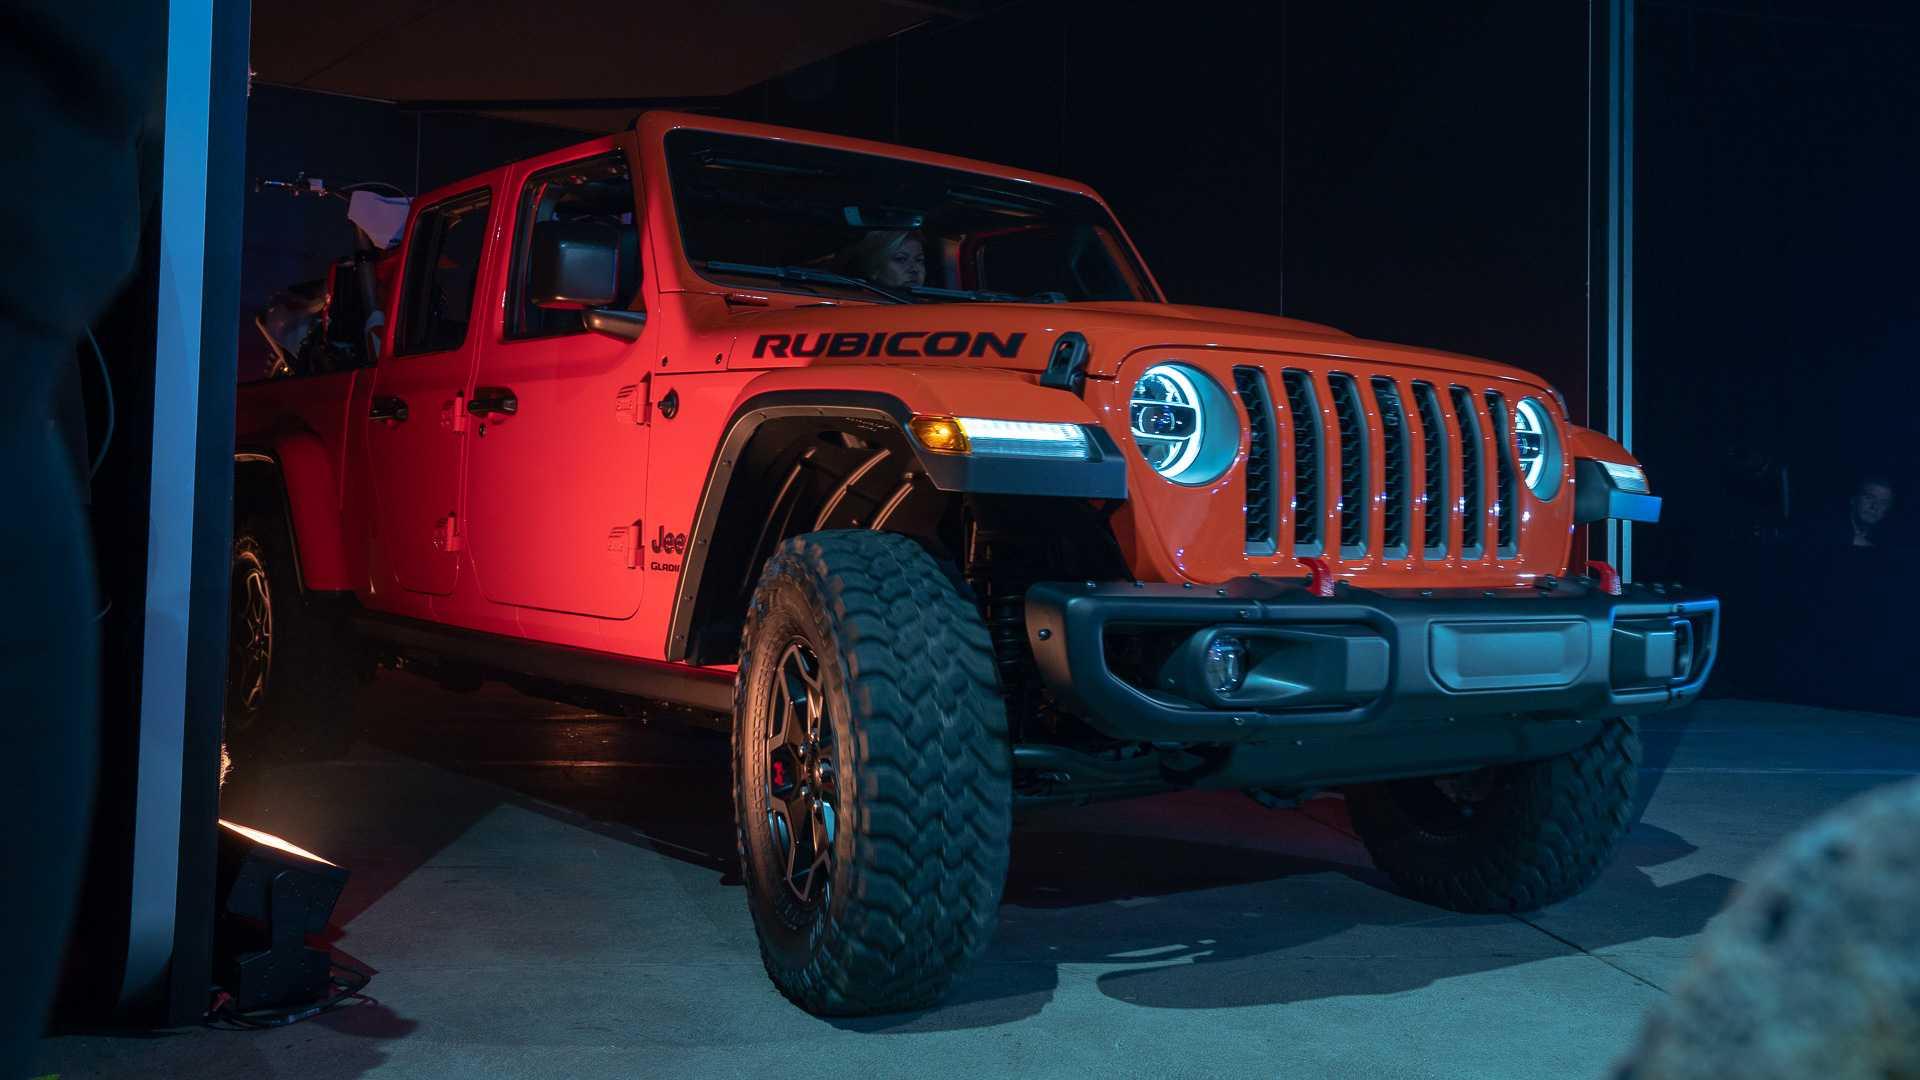 Jeep Gladiator皮卡表态洛杉矶车展 越野与适用性兼备